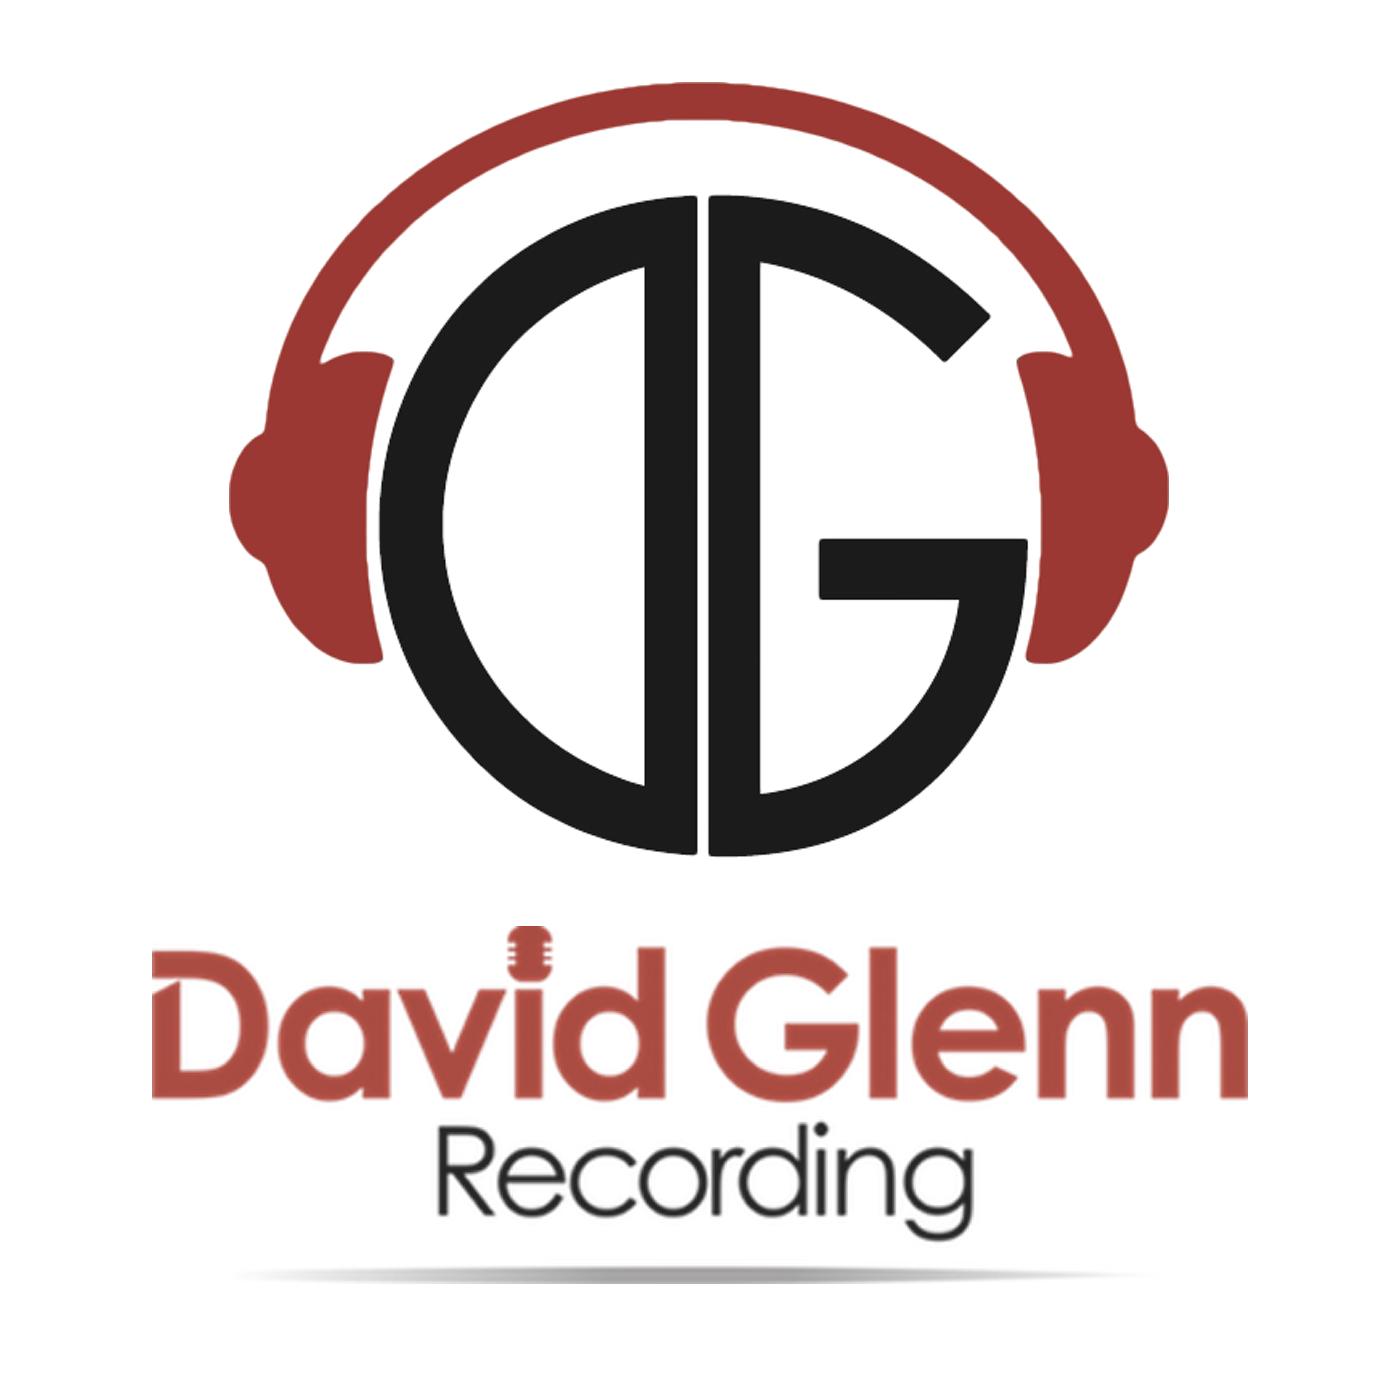 Ask David Glenn